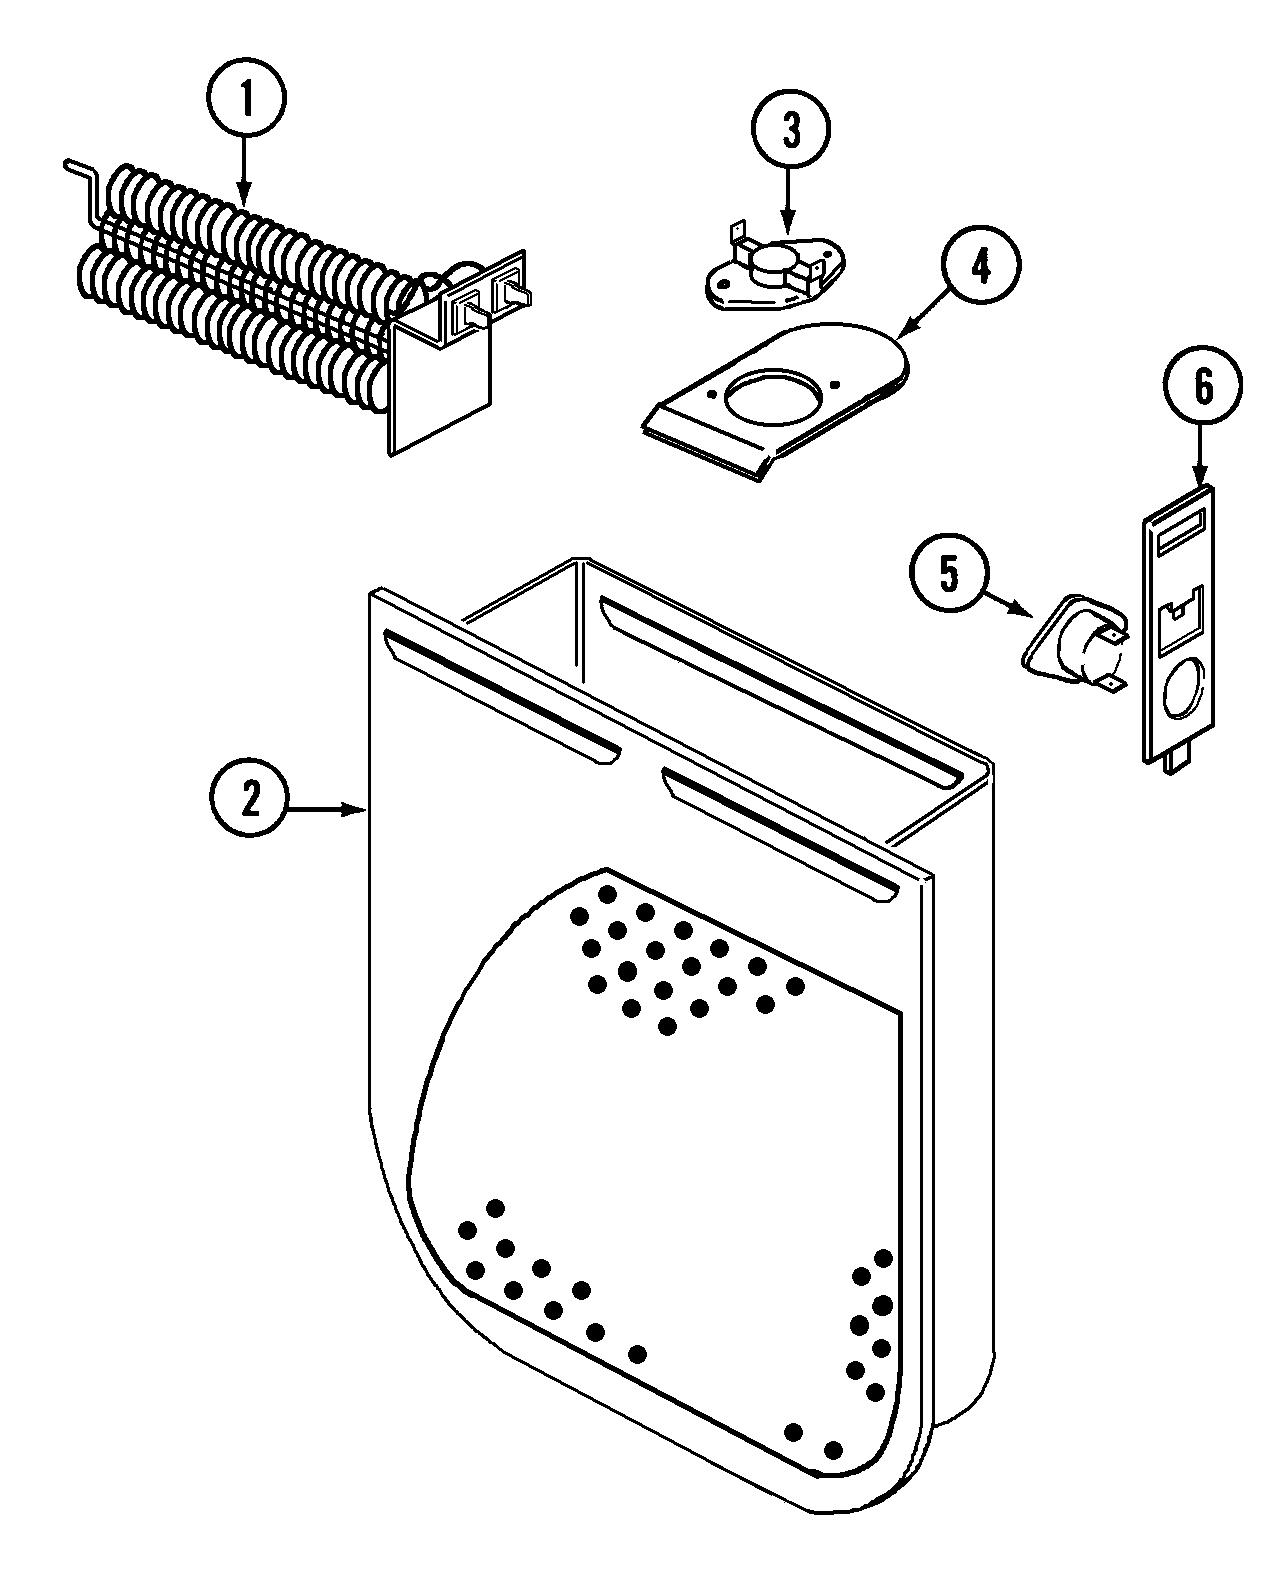 hight resolution of maytag pye4500ayw heater diagram